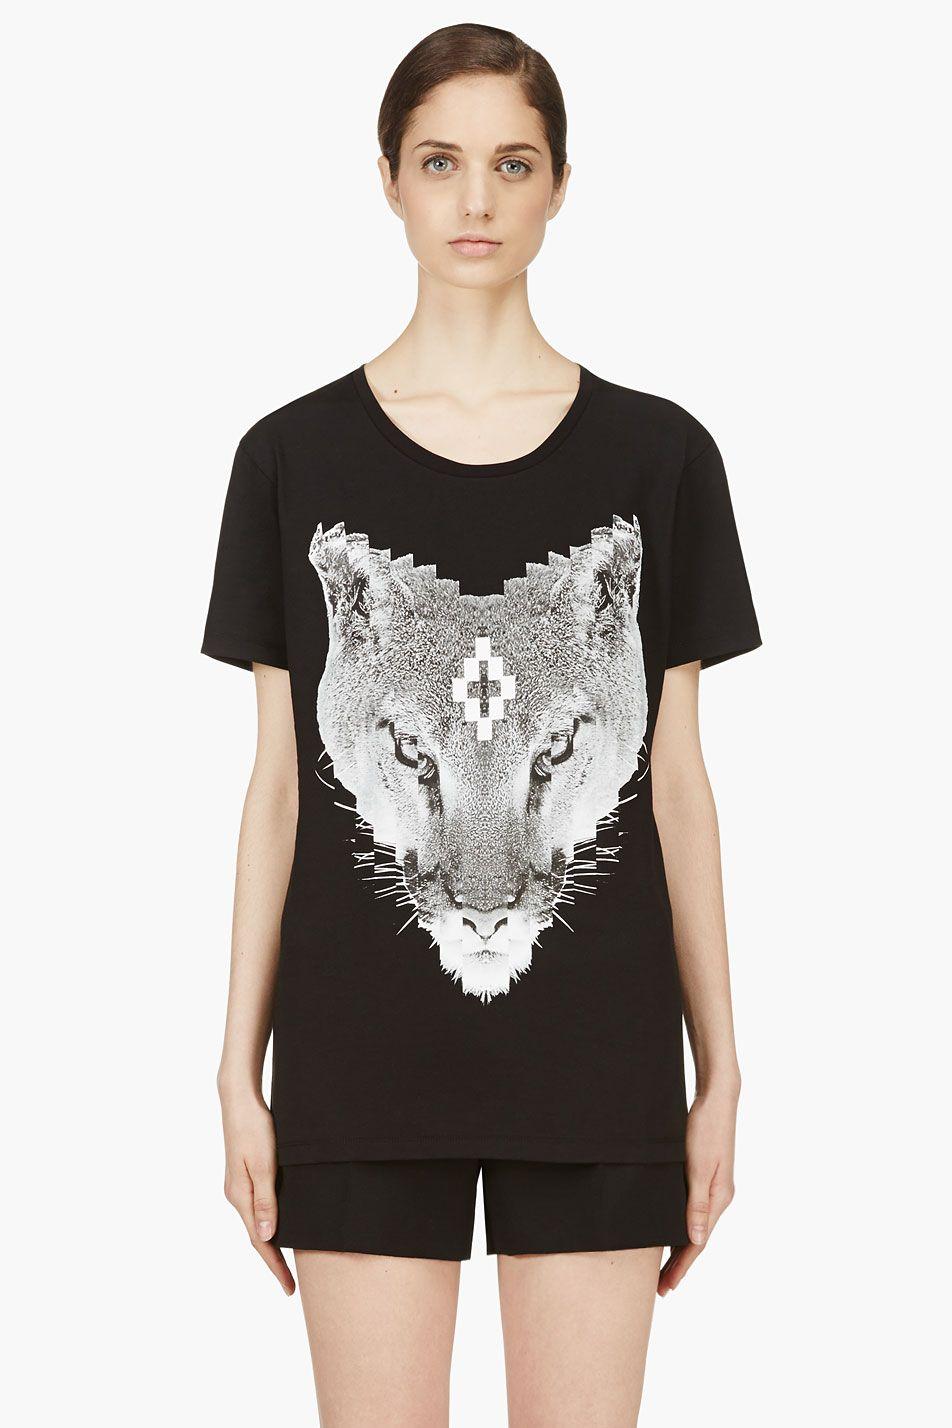 #marceloburlon #tshirt #cat #lynx #wils #black #dark #gothic #chic #cool #fashion